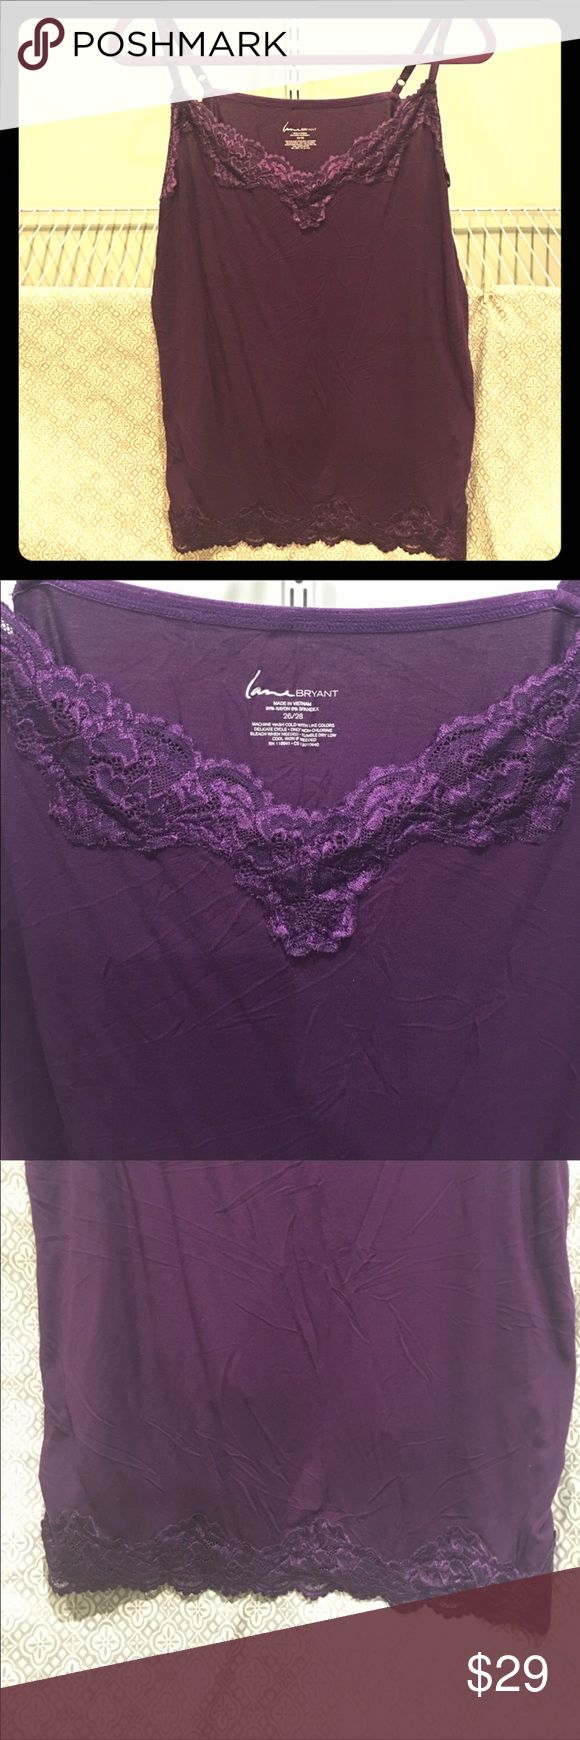 "Plus size 26/28 Lane Bryant Purple Laced Cami 29"" Plus size 26/28 Lane Bryant Purple Laced Cami 29"" length adjustable straps Lane Bryant Tops Camisoles"